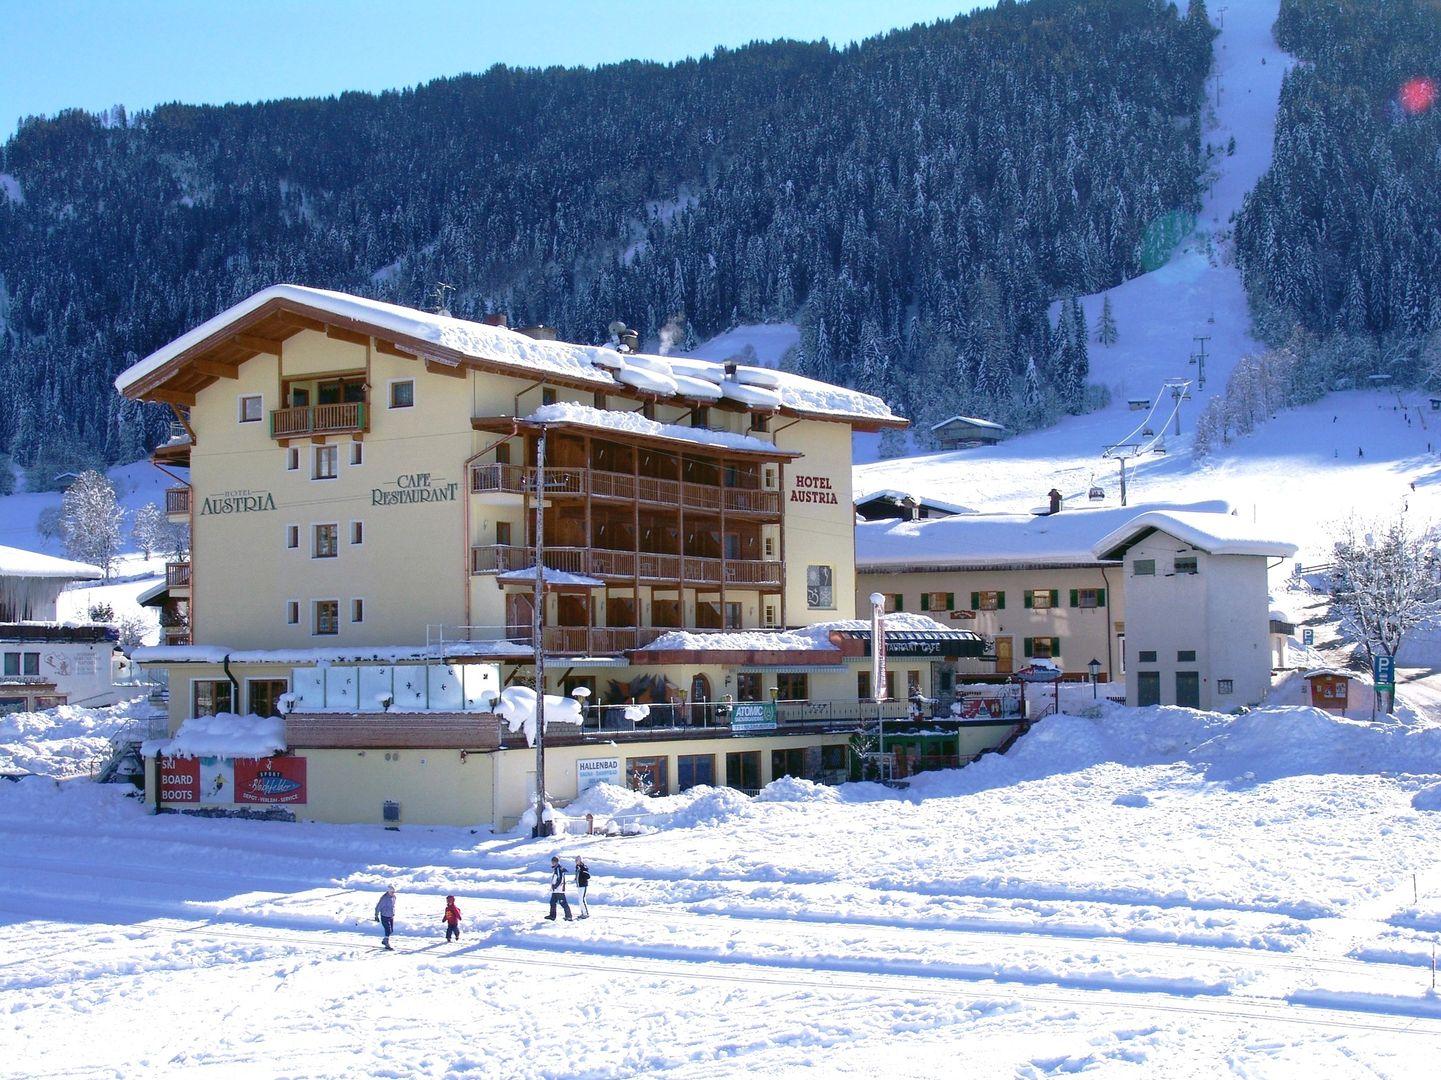 Slide1 - Hotel Austria